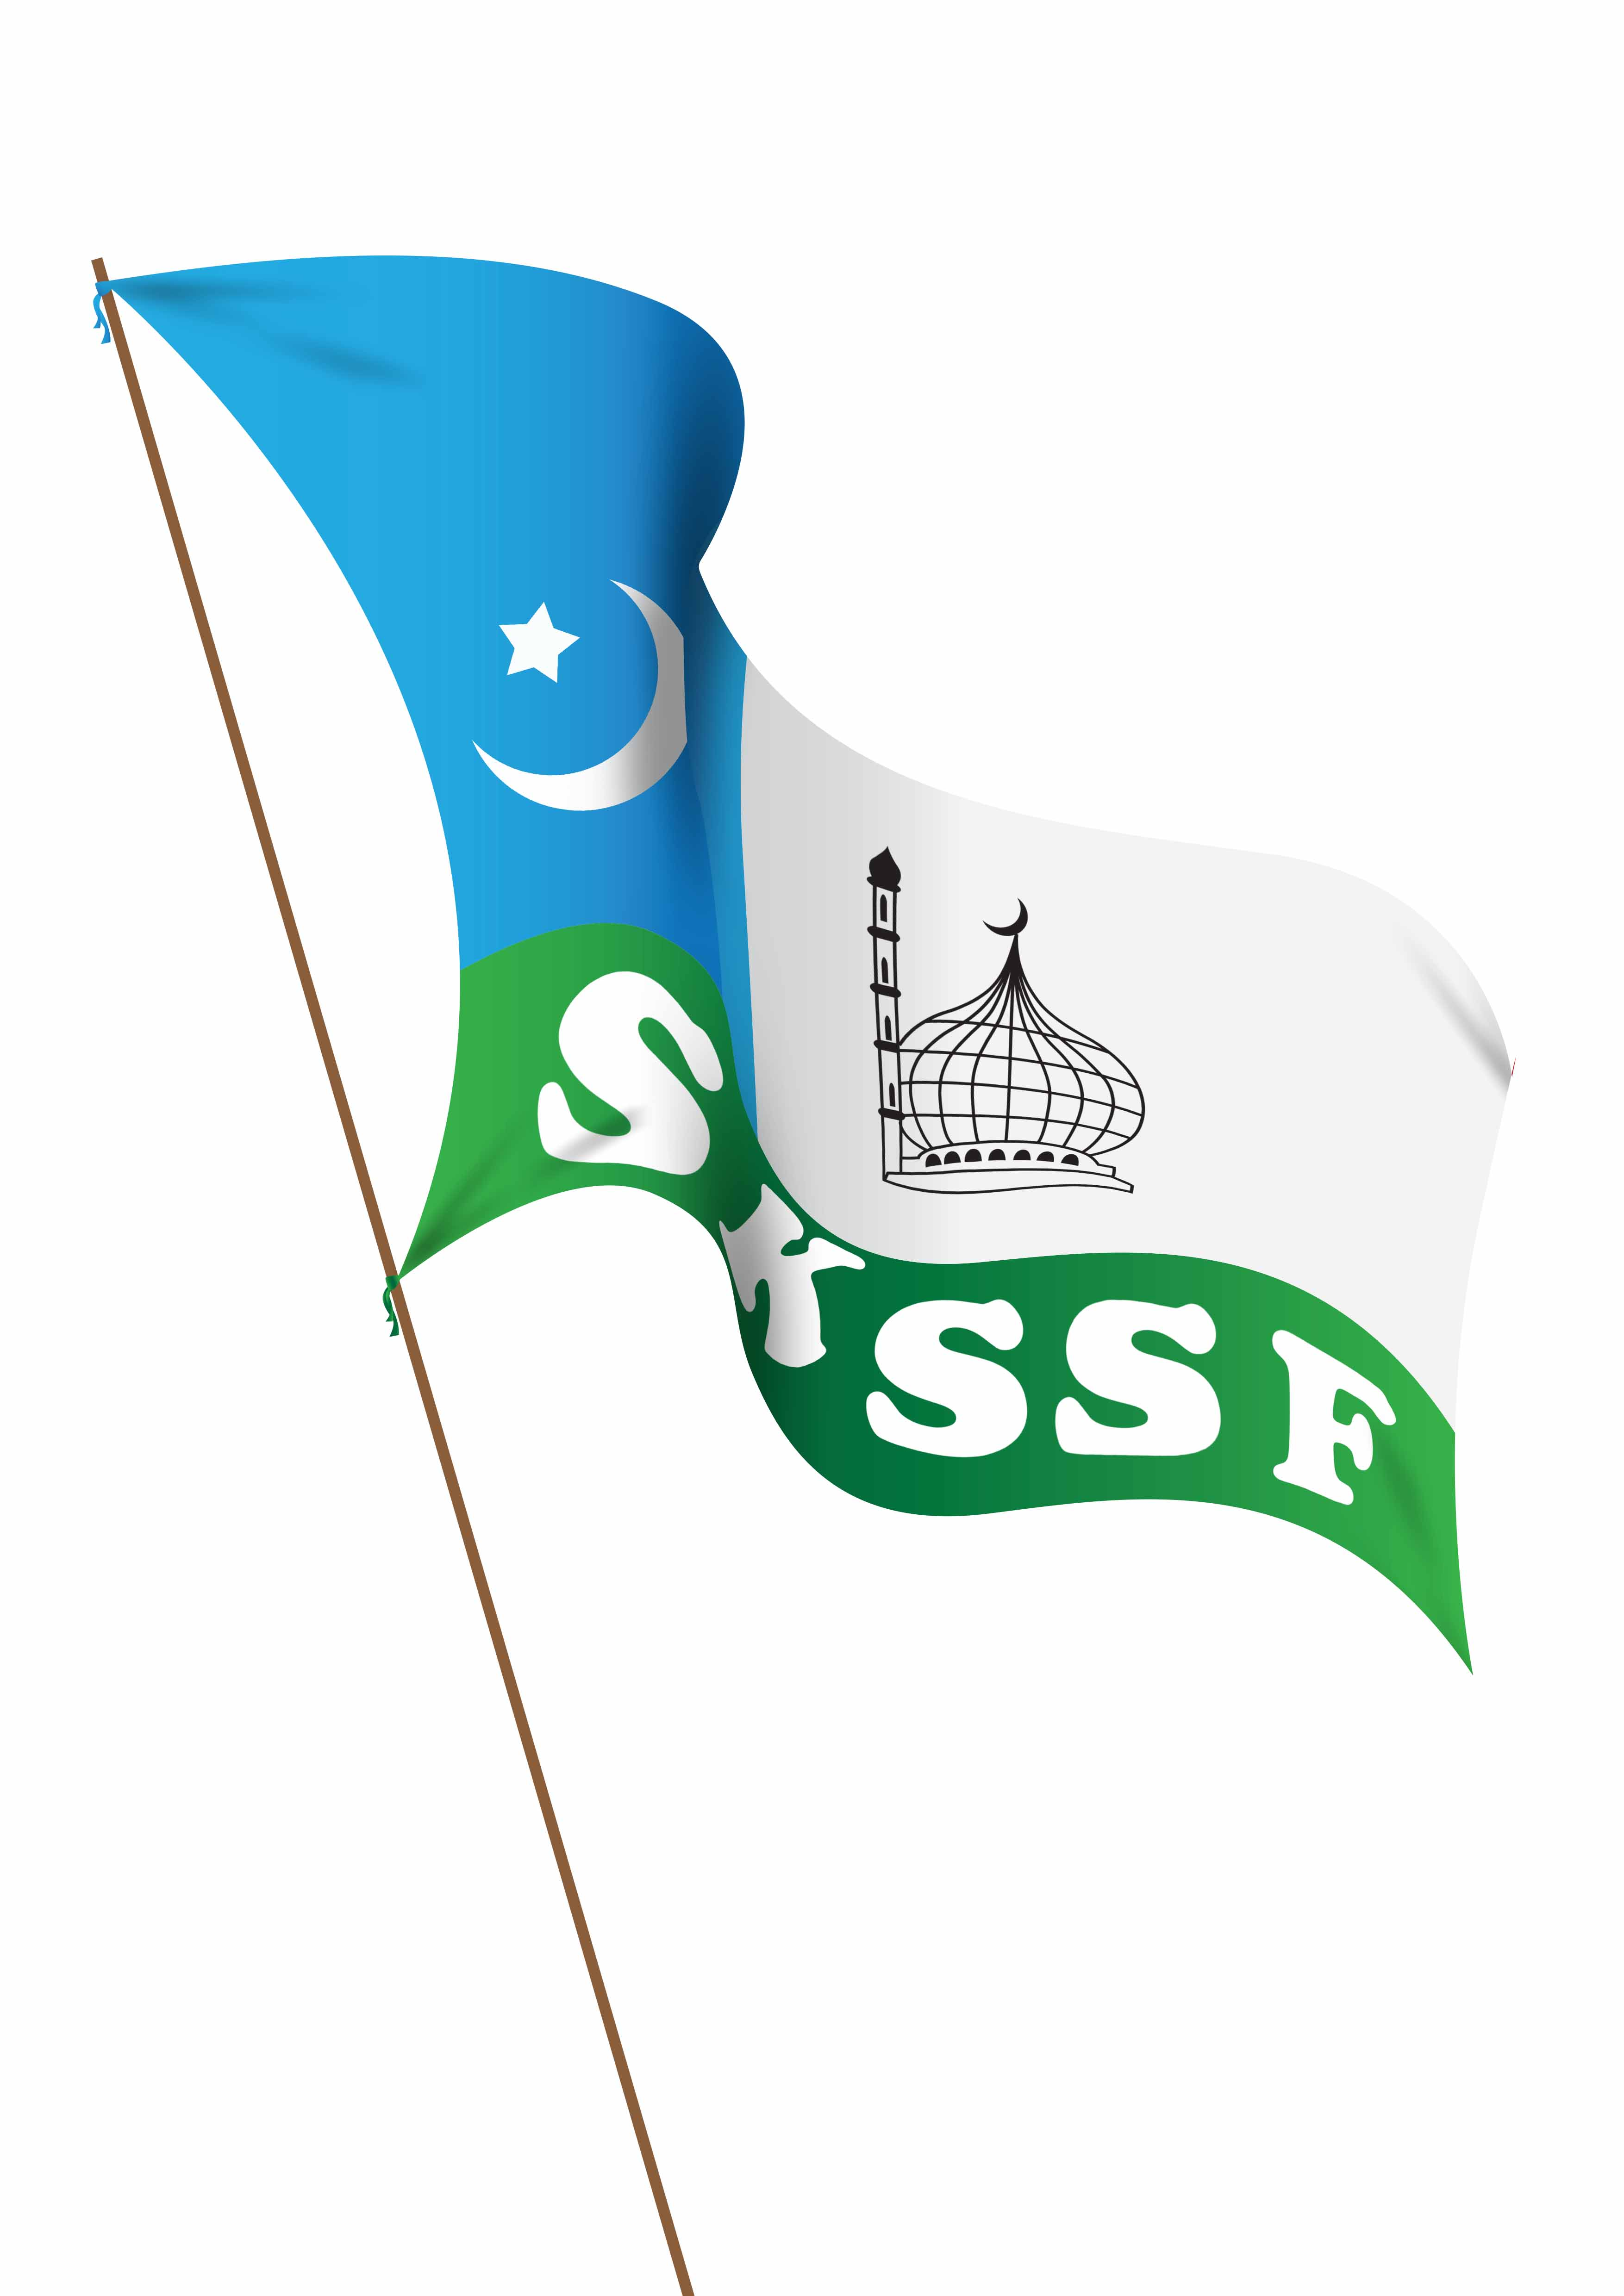 Skssf flag png Transparent pictures on F.